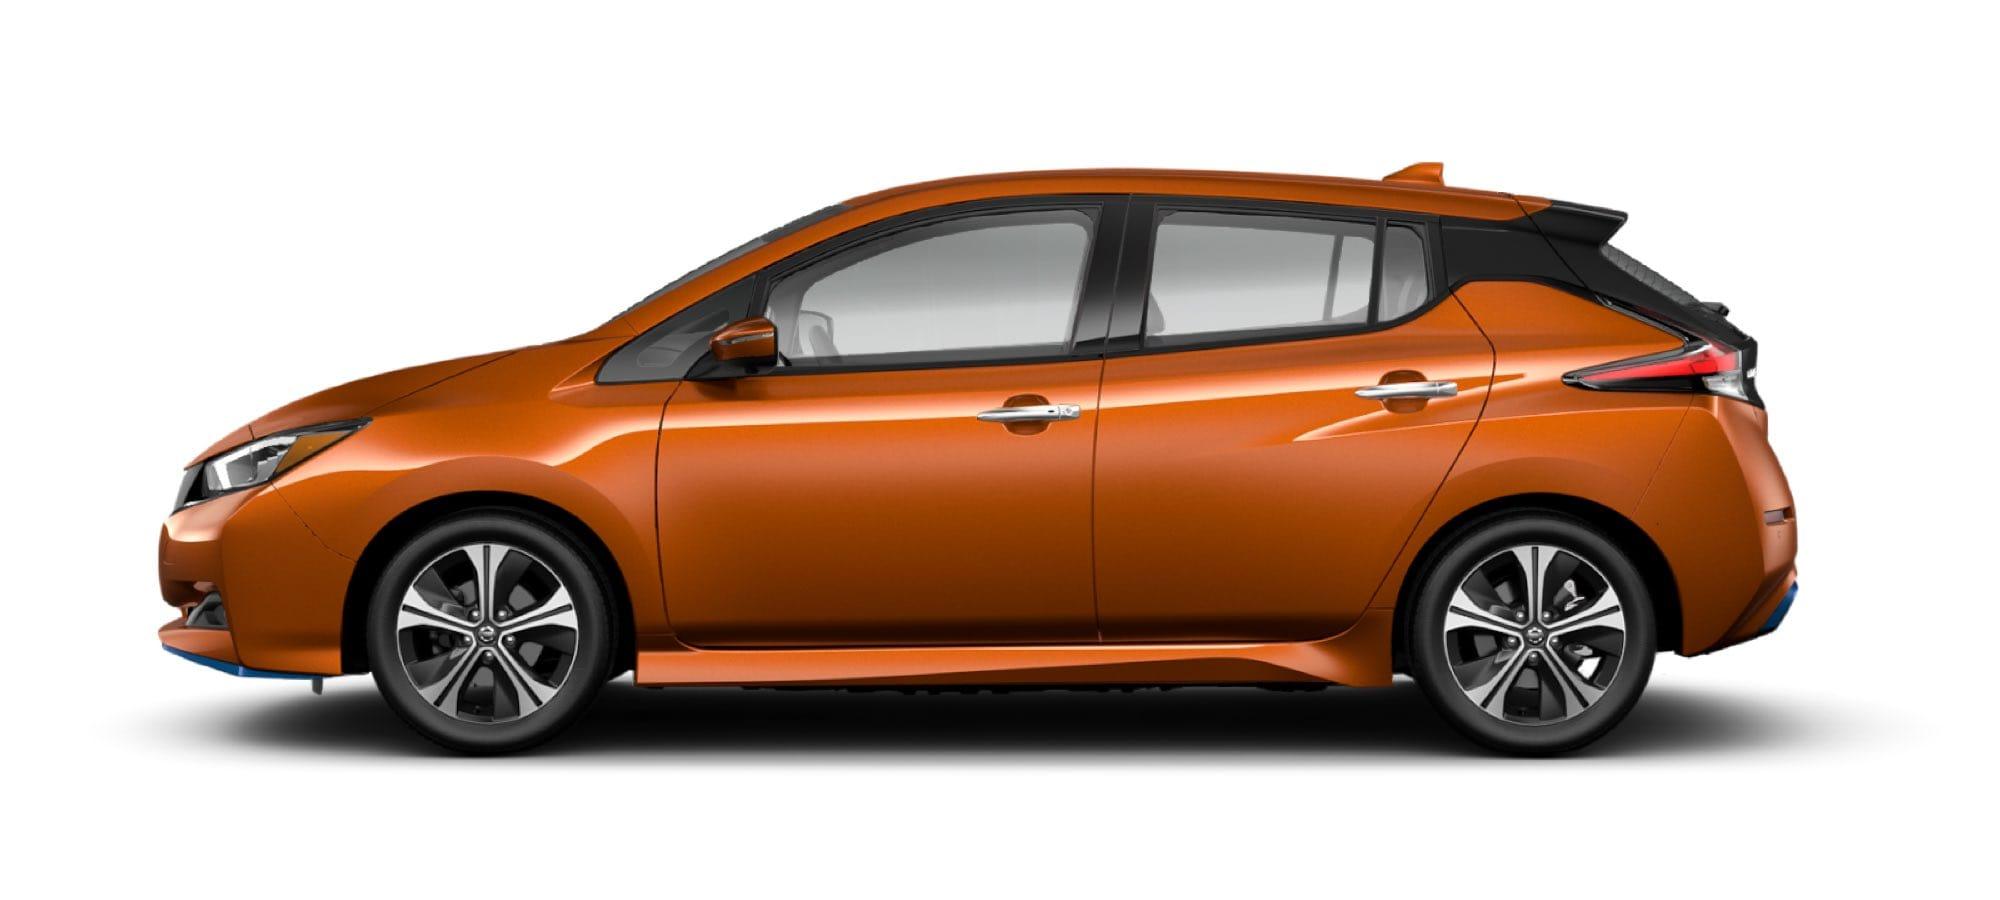 2021 Nissan LEAF in Sunset Drift Chroma Flair